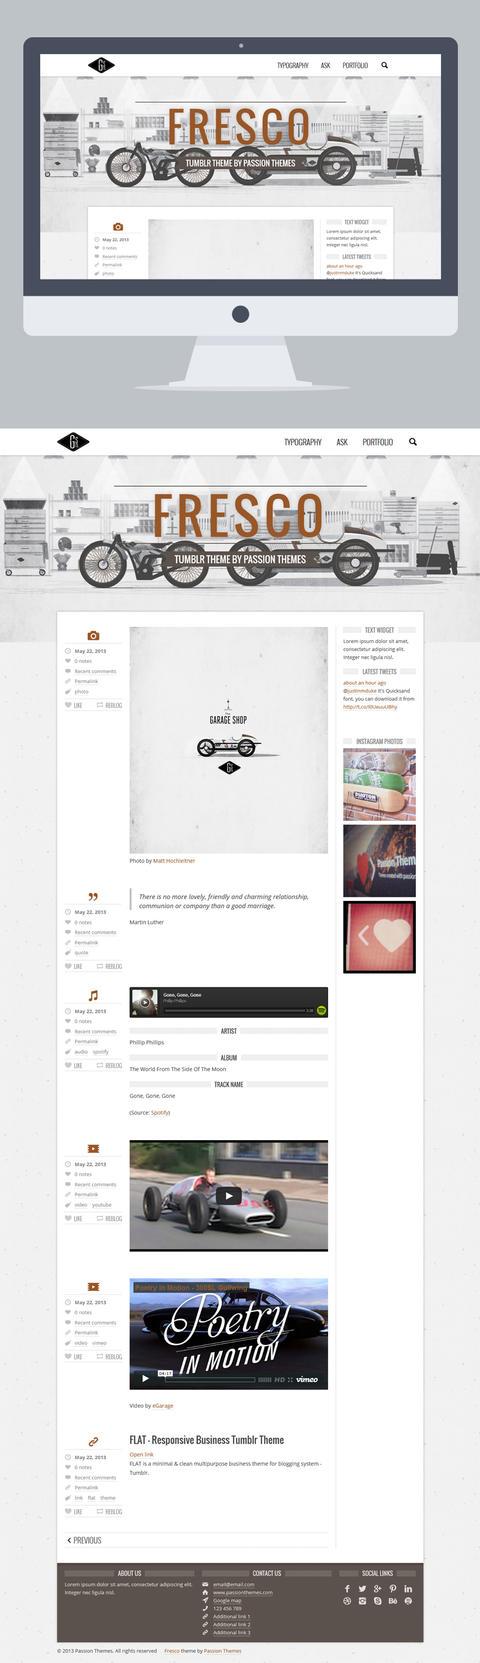 FRESCO - Responsive Multipurpose Tumblr Theme by PassionThemes